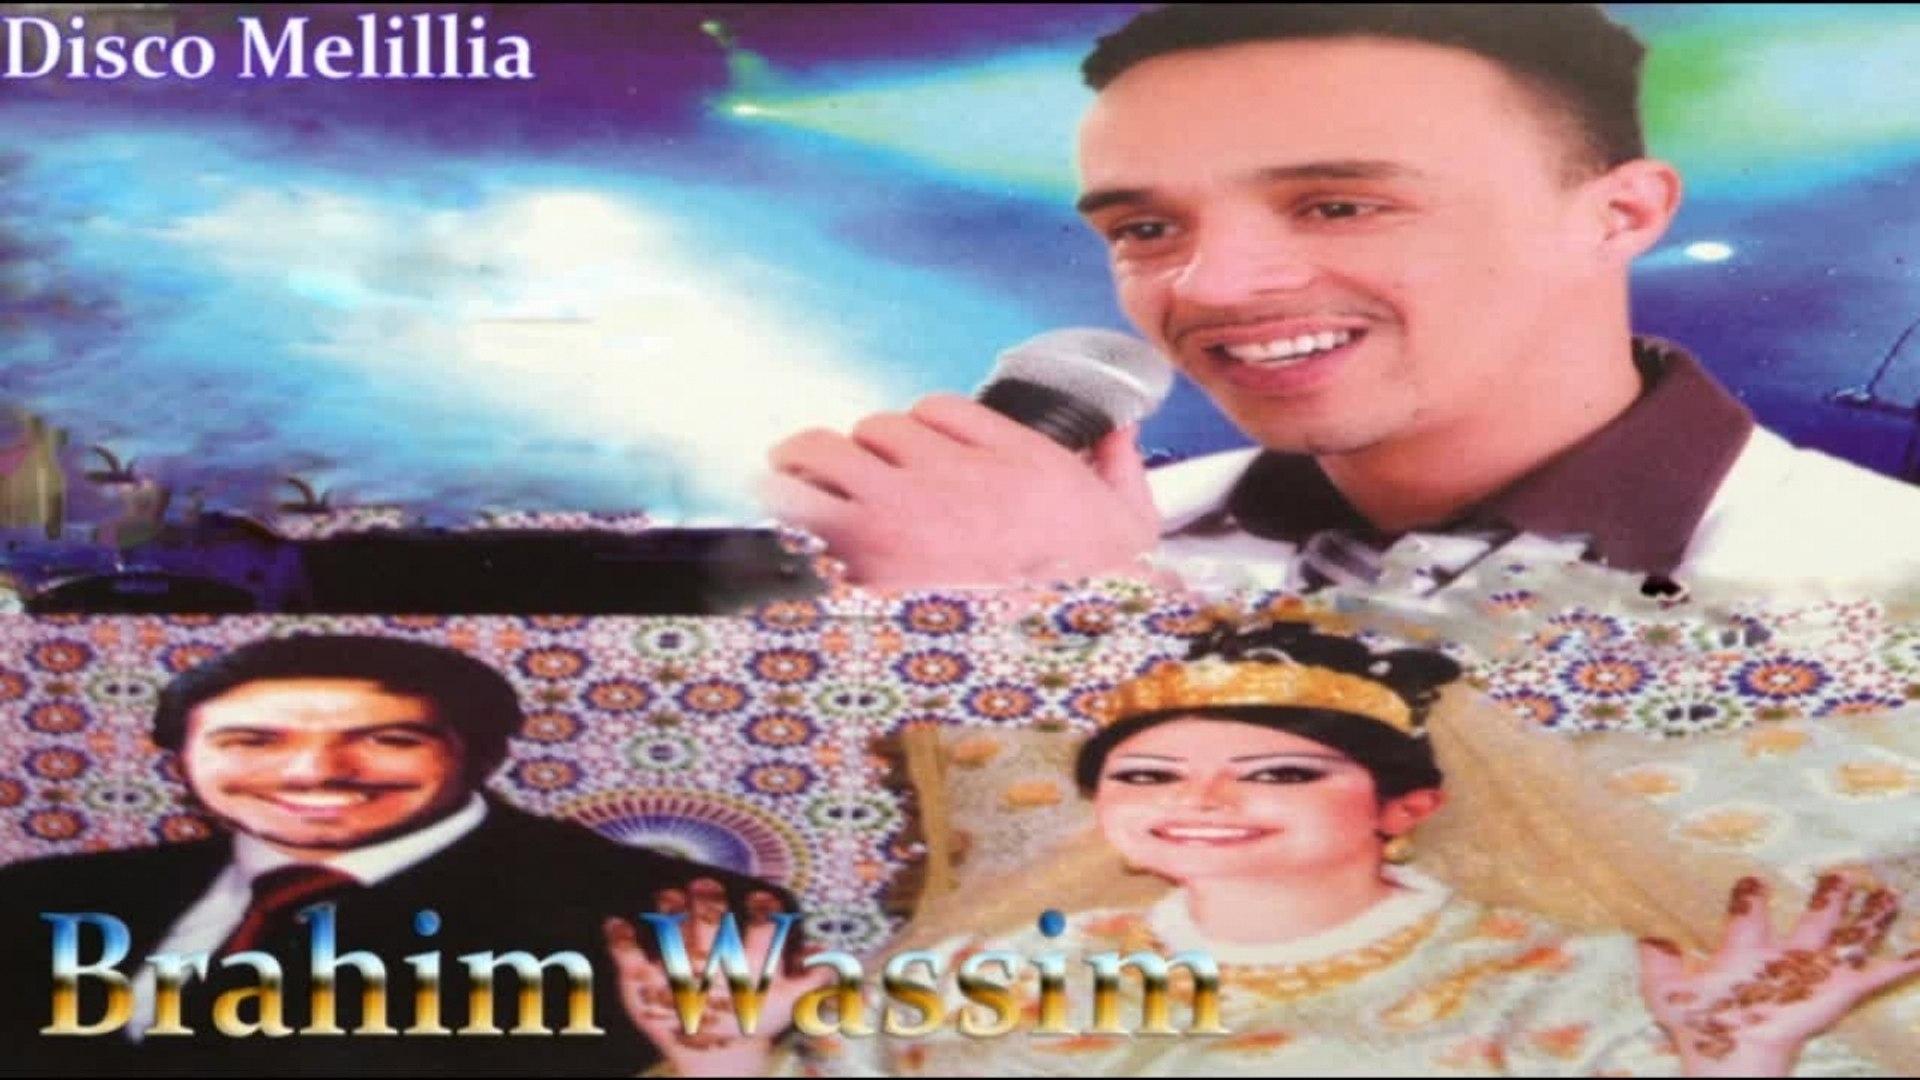 Brahim Wassim - Moray Mindach Khsan - Official Video